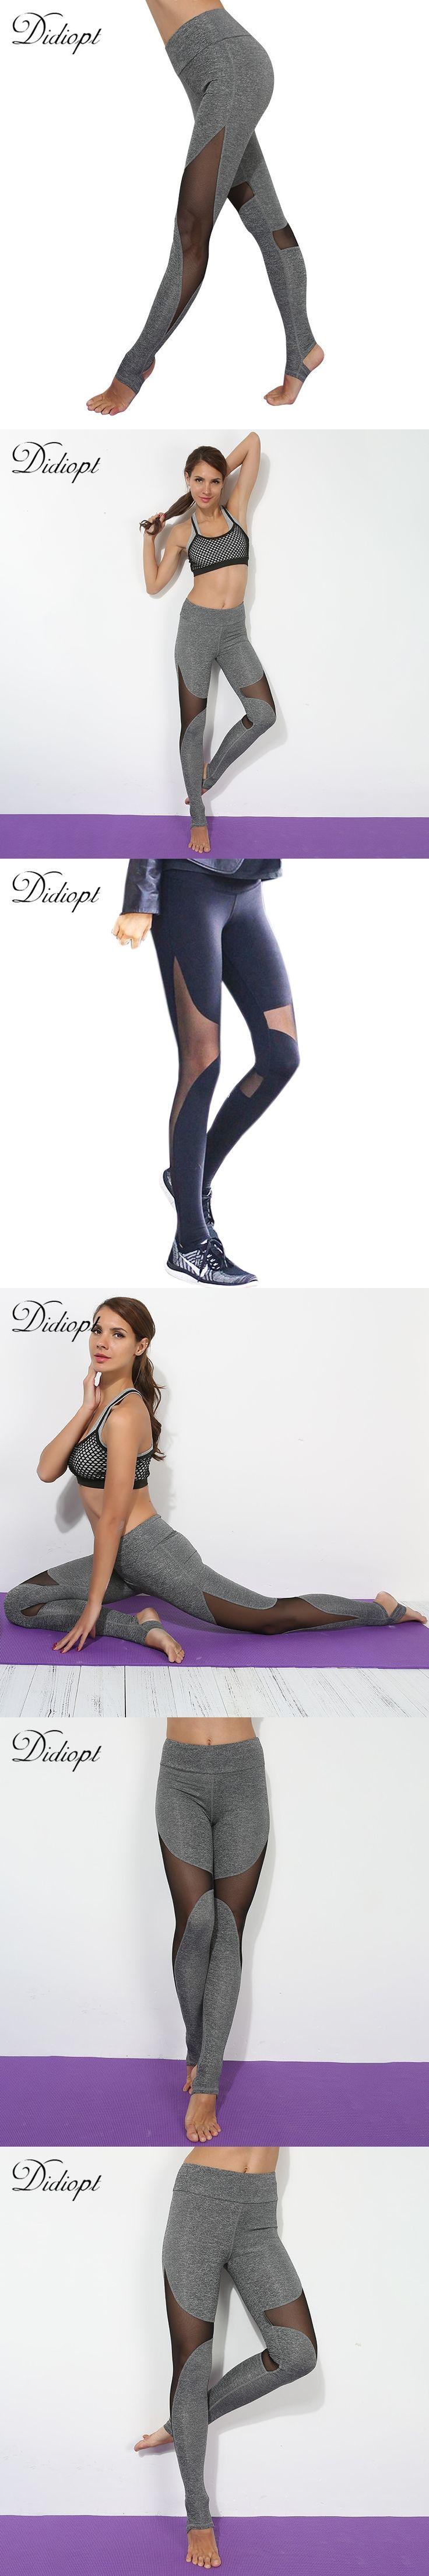 Sport Leggings Skinny Yoga Panties Transparent Patckwork Fitness Leggings Women's Running Pant High elasticity Workout Leggins